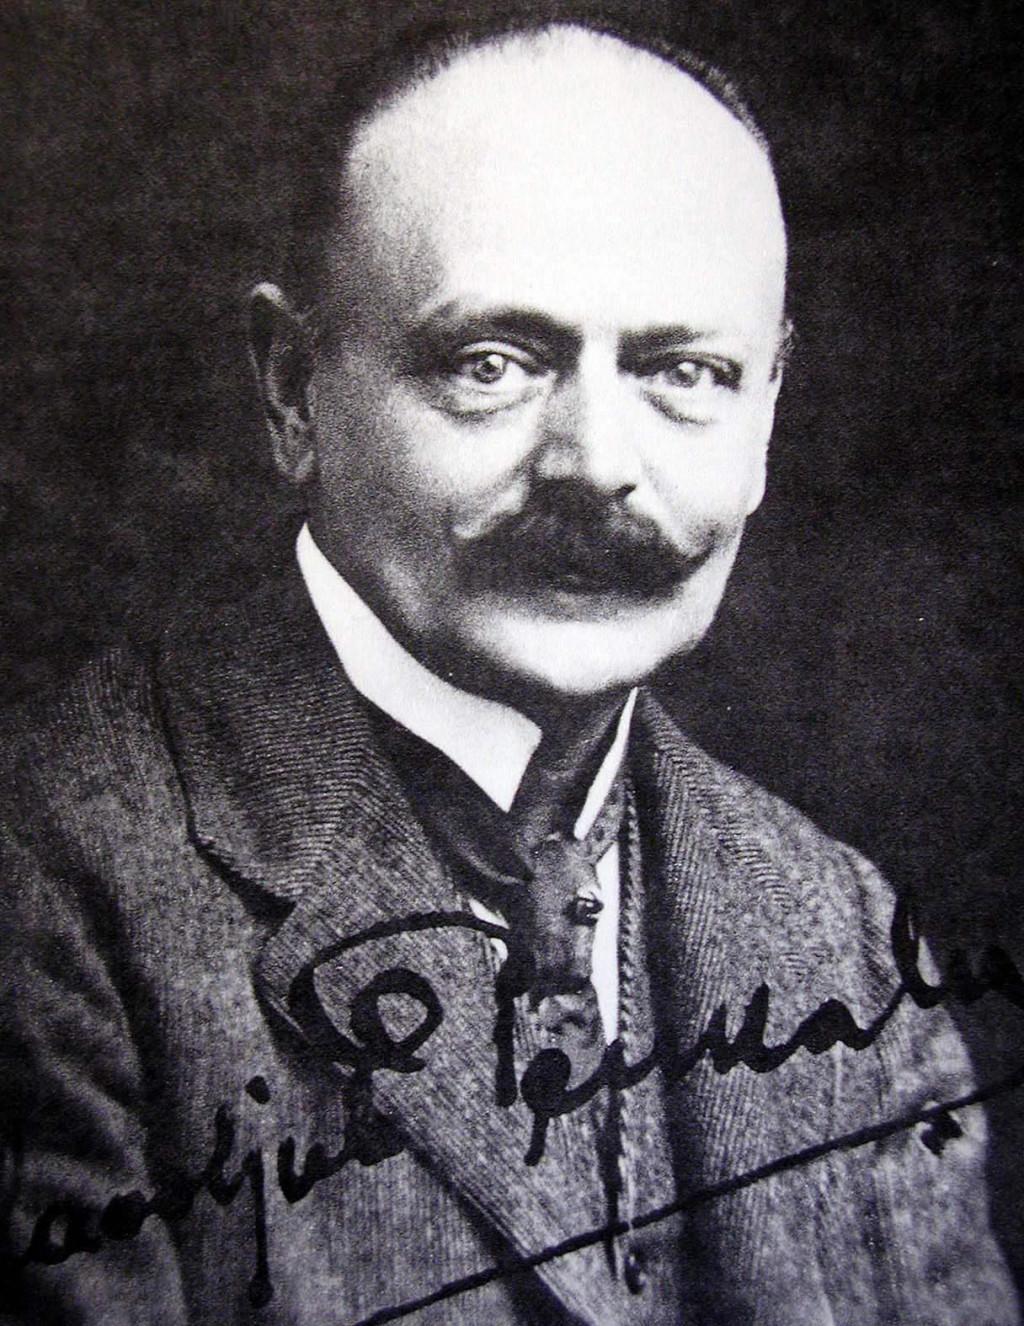 Naturalizirani Hrvat Eduard Slavoljub Penkala, rođen kao polu-Poljak polu-Nizozemac